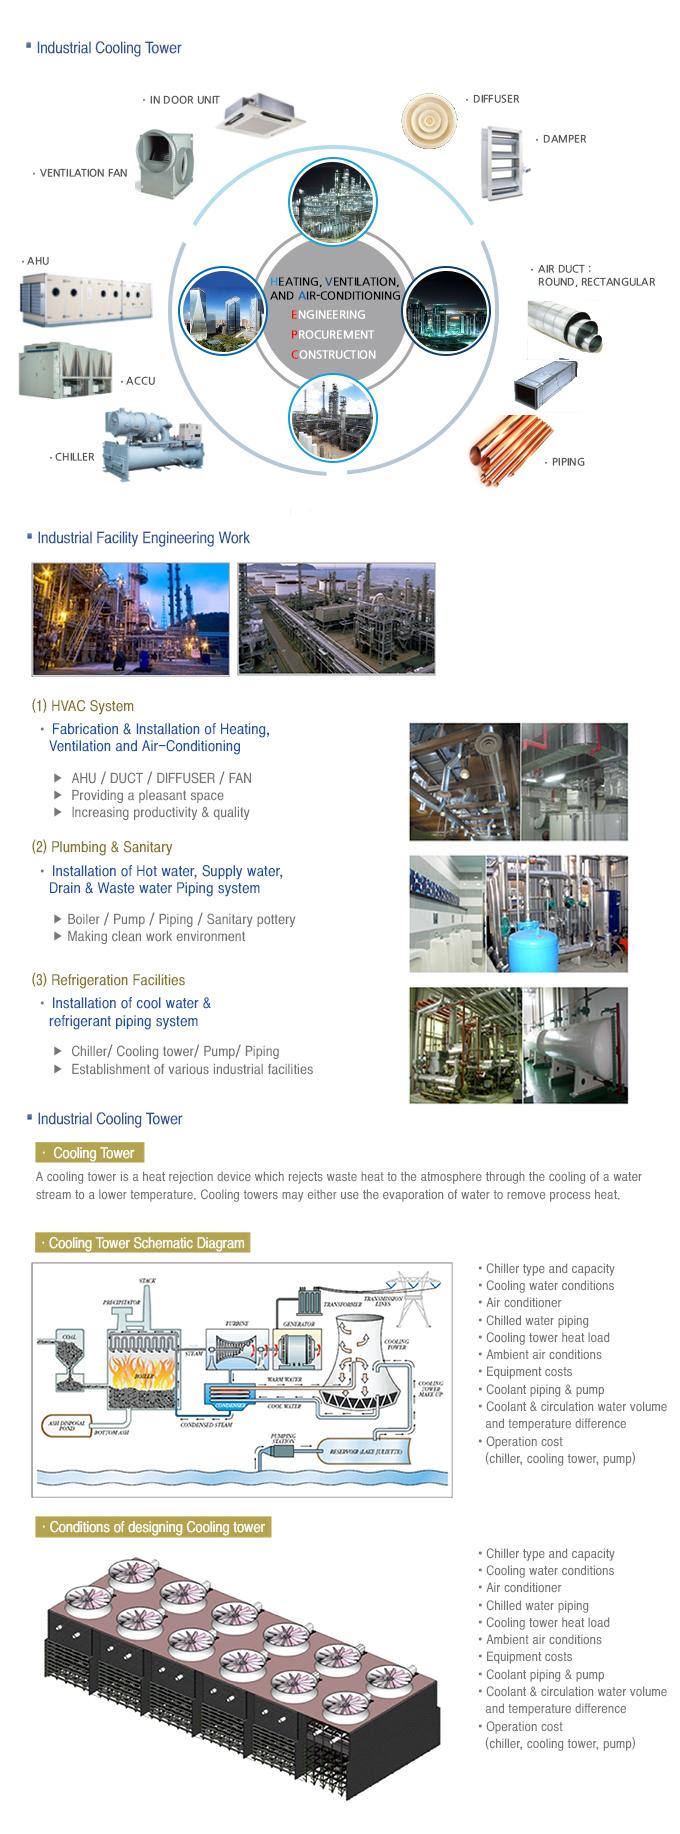 SHINSUNG ENGINEERING HVAC Plant Business